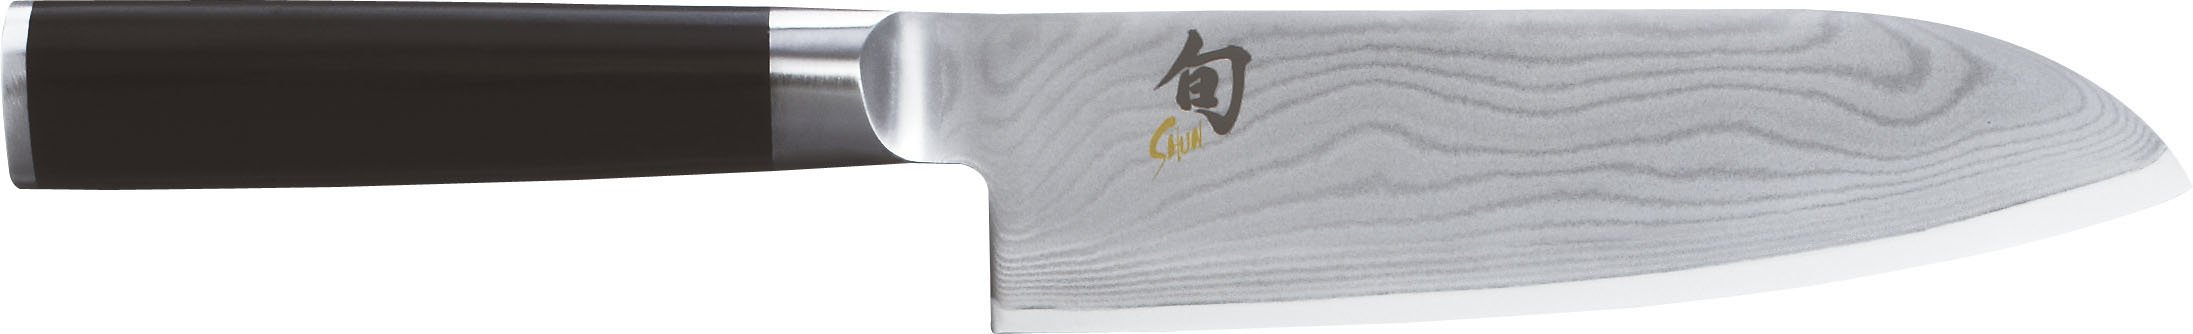 Shun DM0702 Classic 7-Inch Santoku Knife by Shun